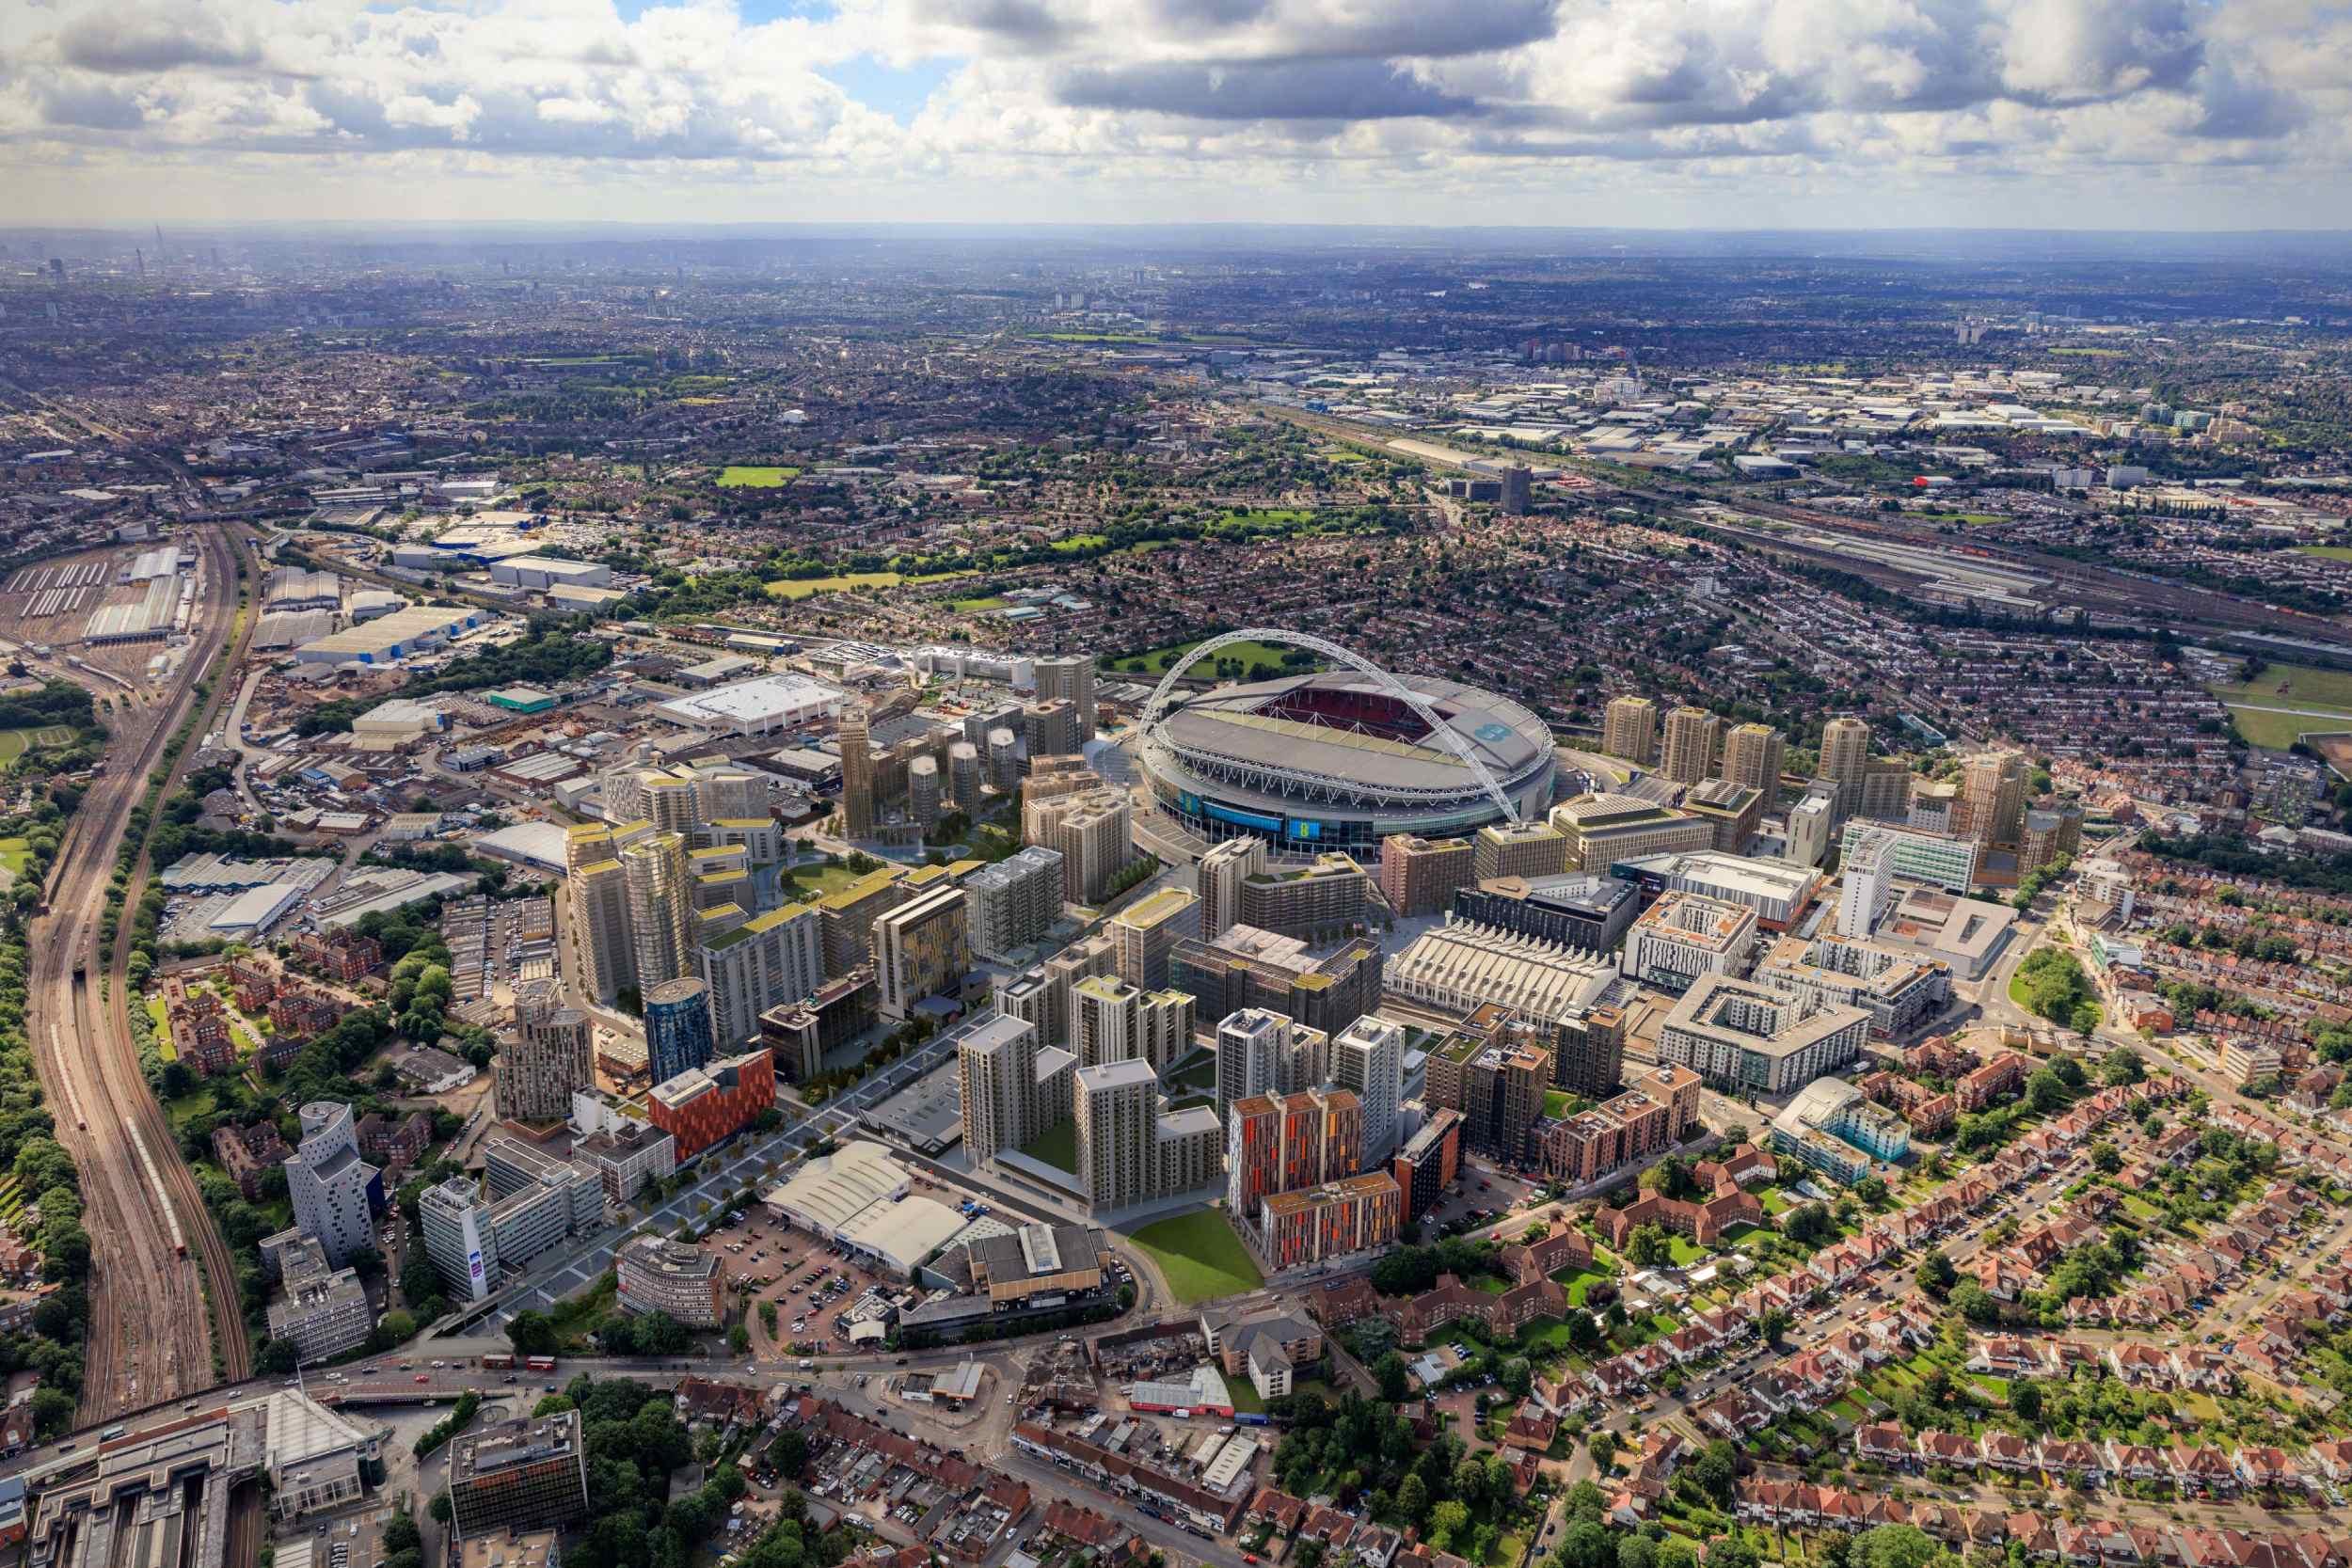 002_Wembley Park.jpg